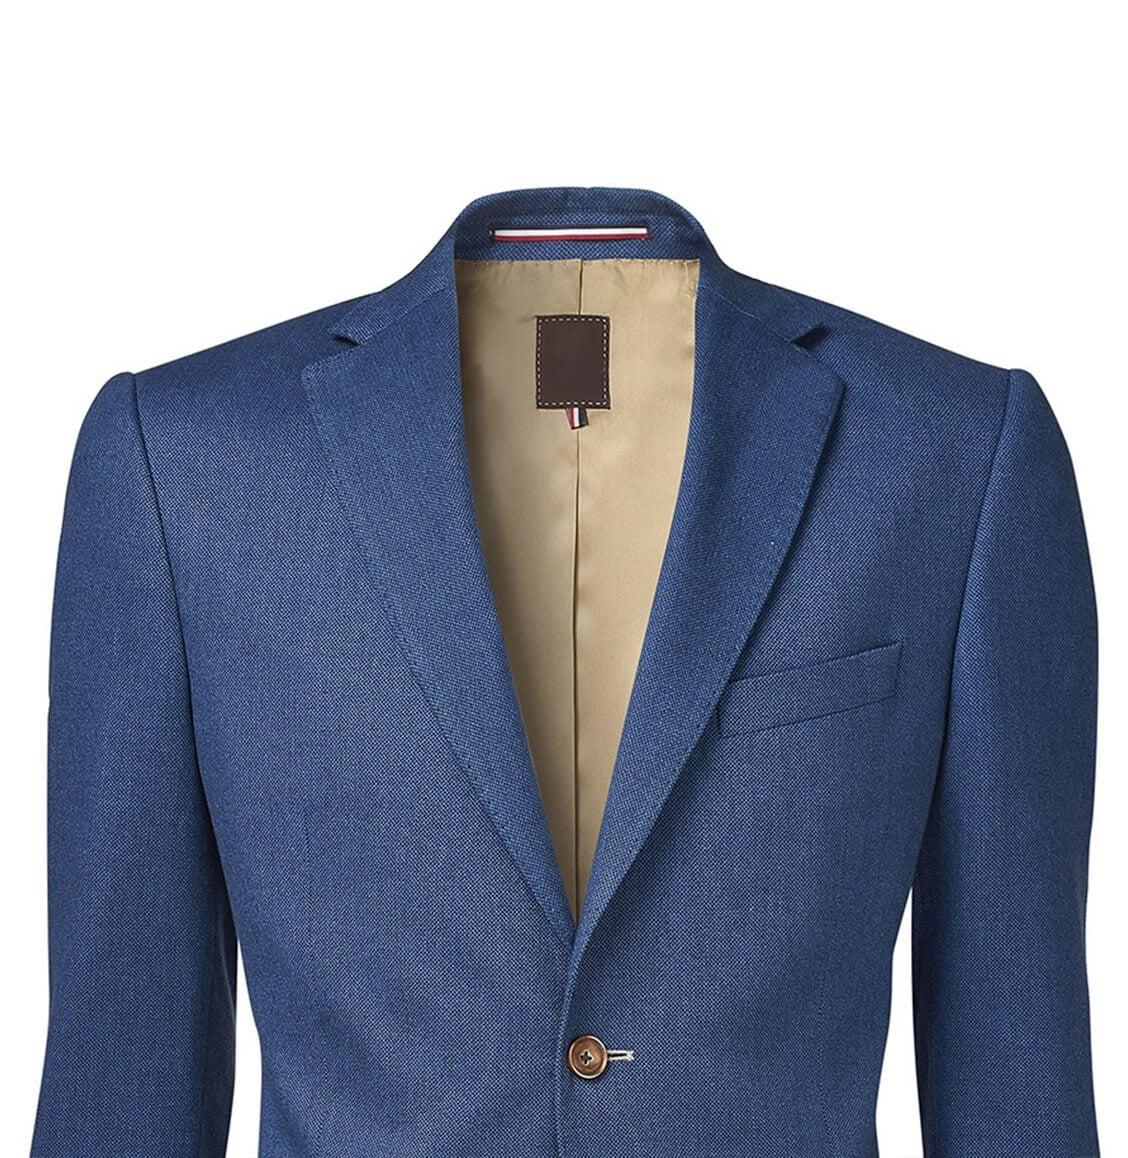 Freistellen Hollow Man Montage Jacket blau